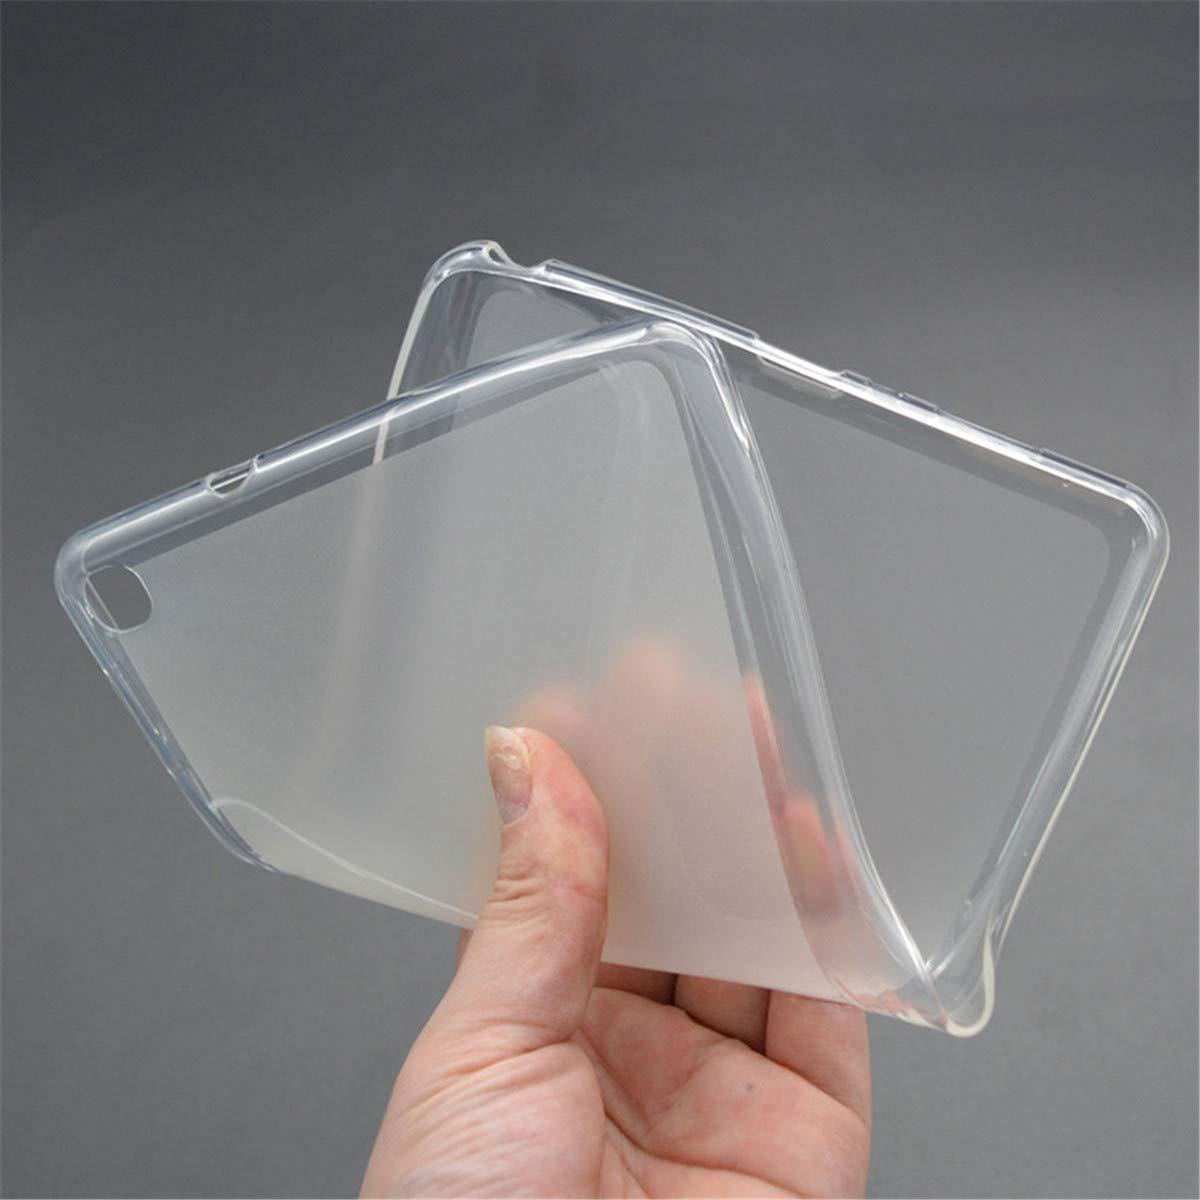 For Samsung Galaxy Tab A 8.0 2019 Case TPU Silicon Transparent Slim Cover Tab A 8.0